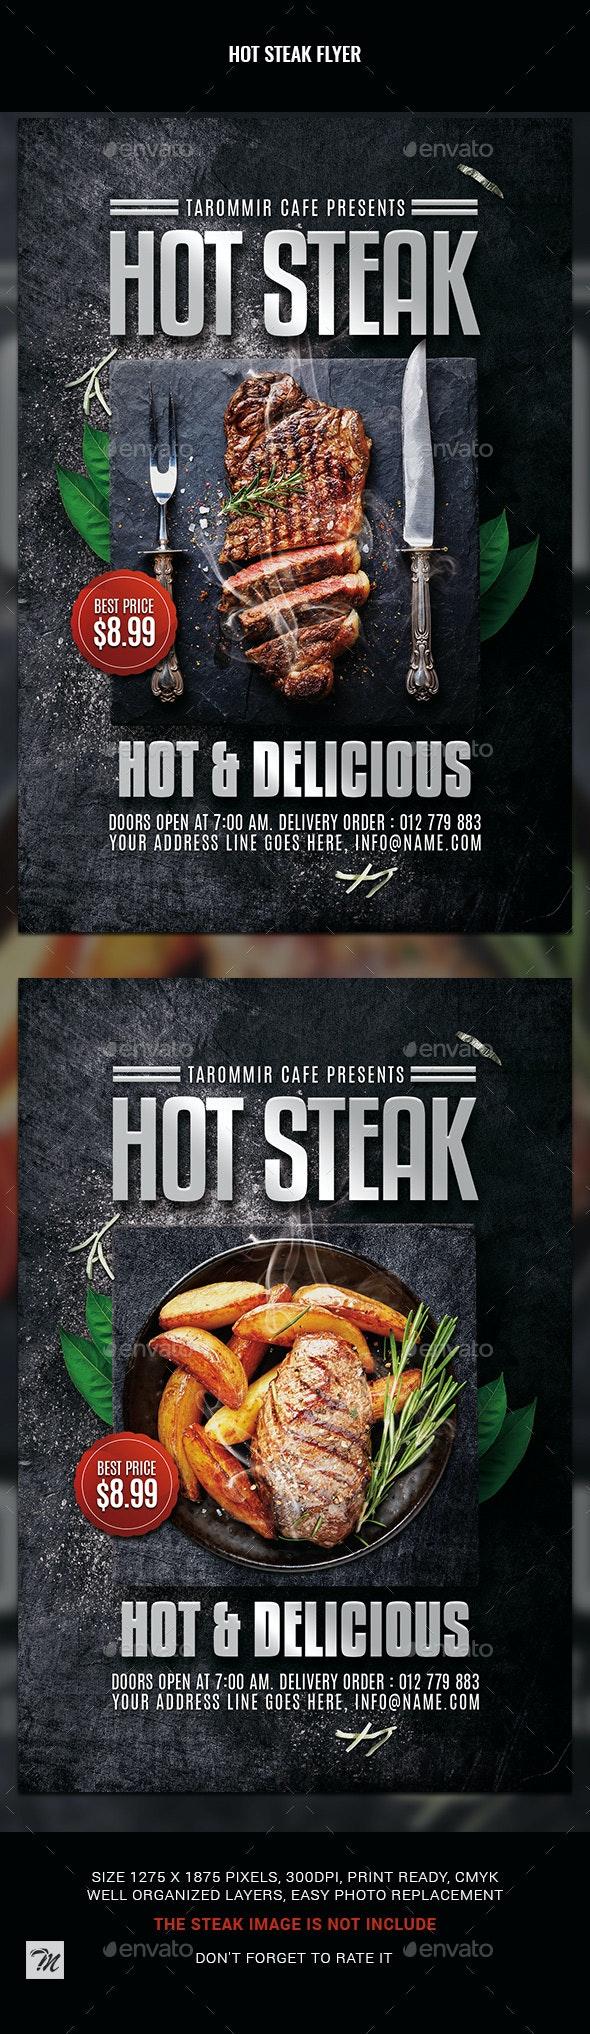 Hot Steak Flyer - Restaurant Flyers